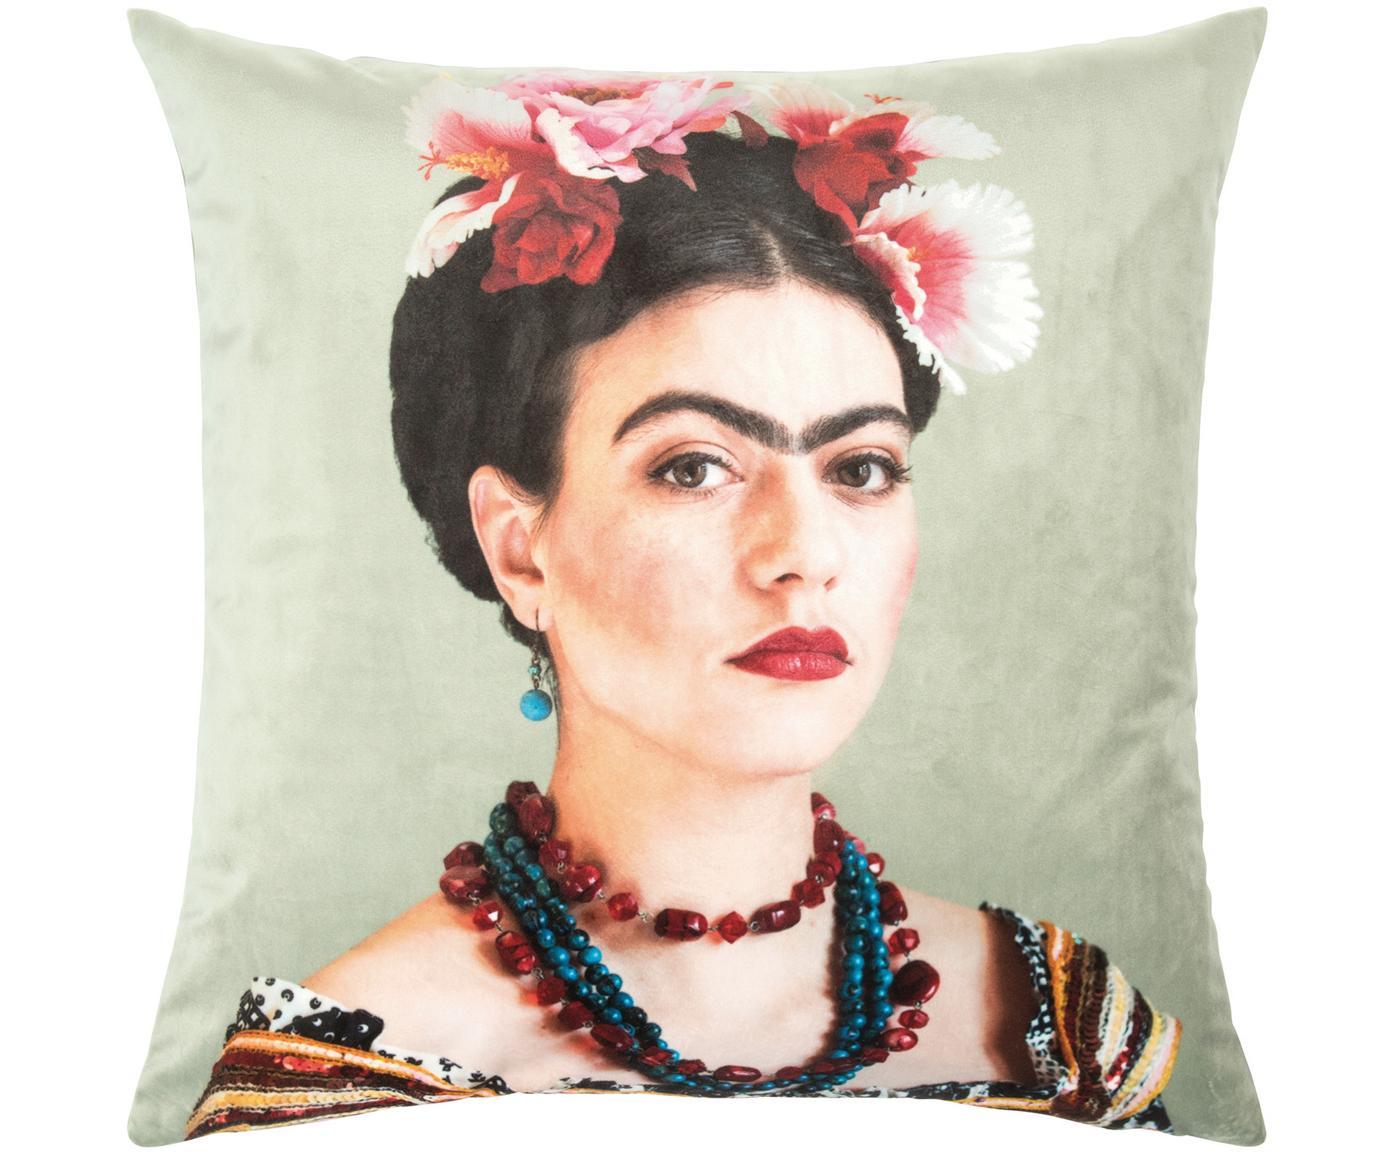 Fluwelen kussenhoes Frida, Polyester fluweel, Mintgroen, 45 x 45 cm